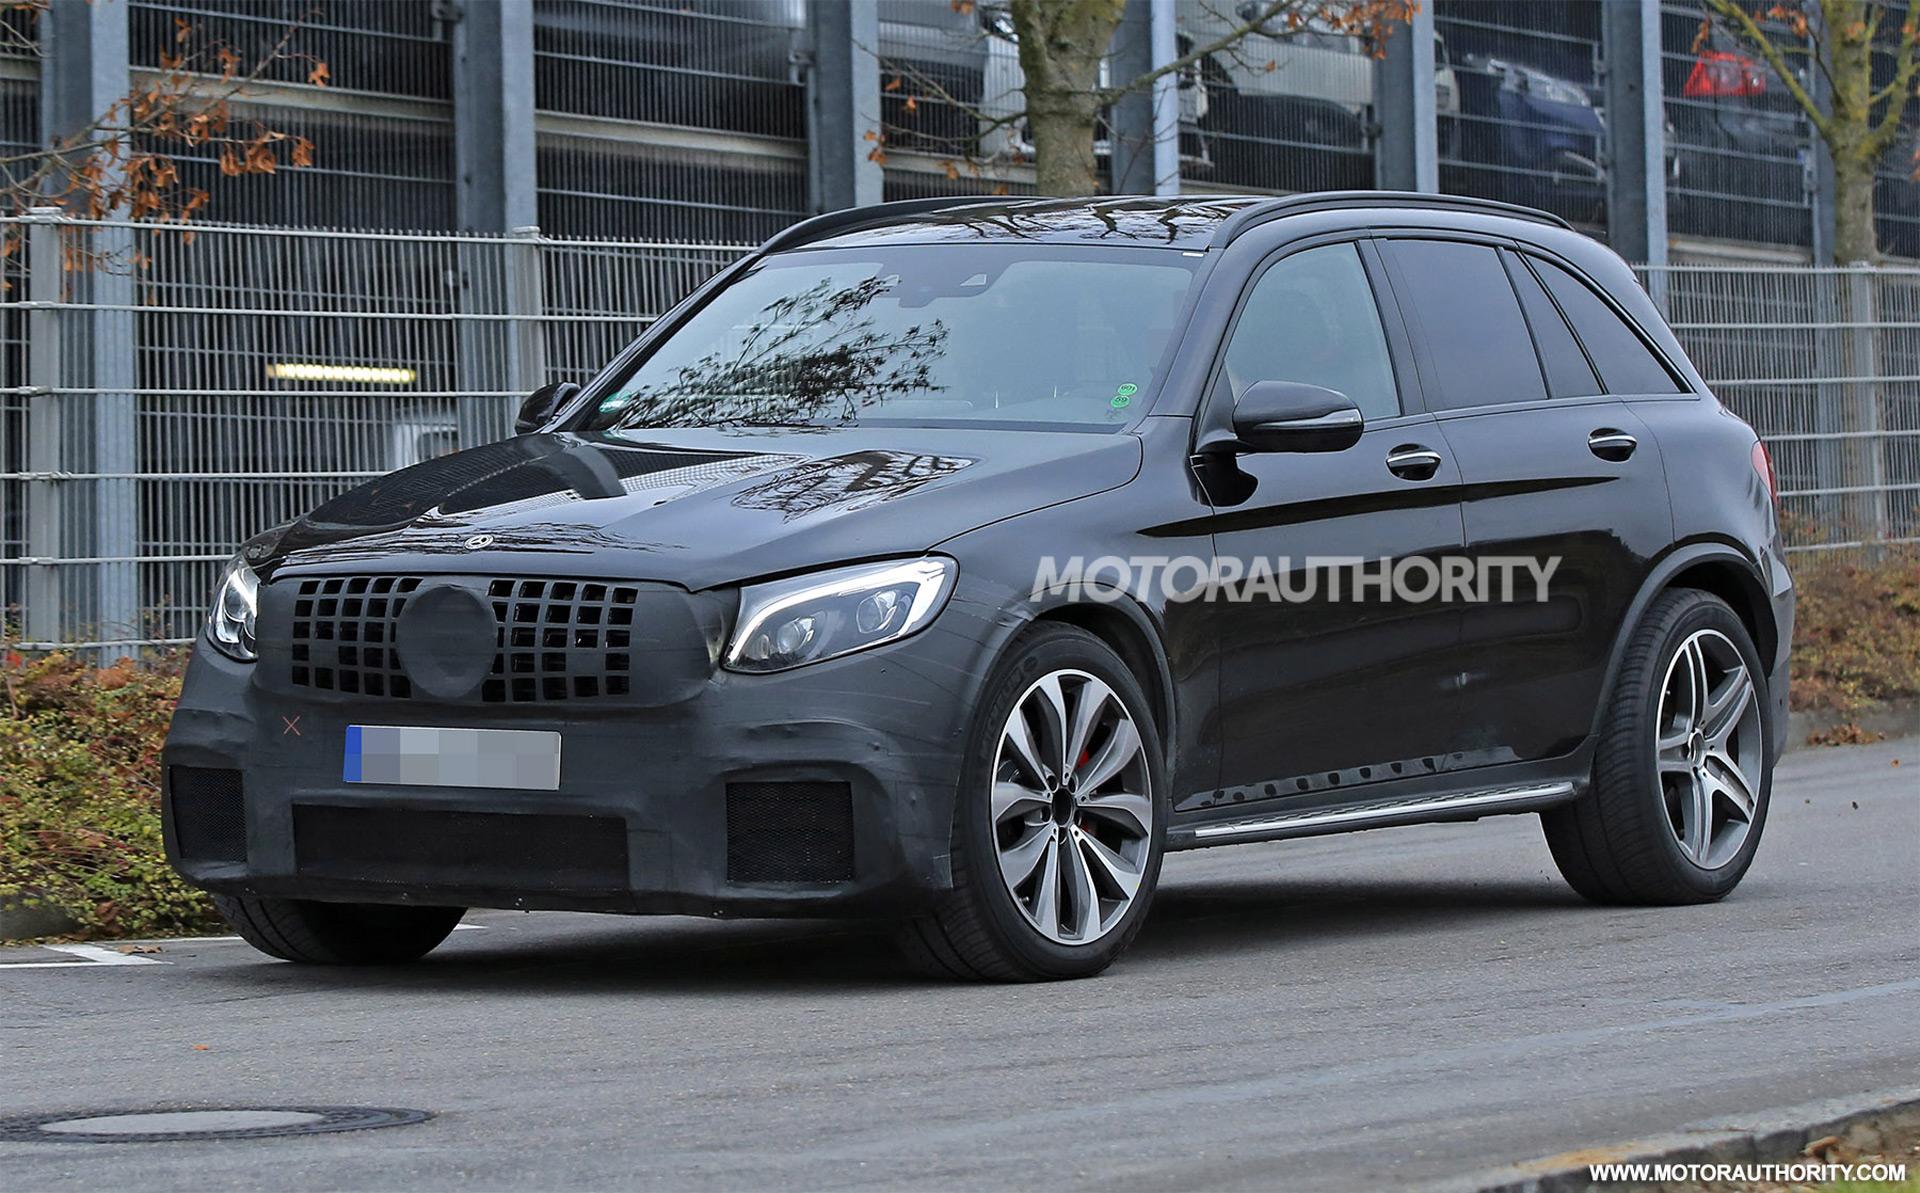 Mercedes-AMG GLC63, Huracán RWD Spyder, VW Arteon shooting ...